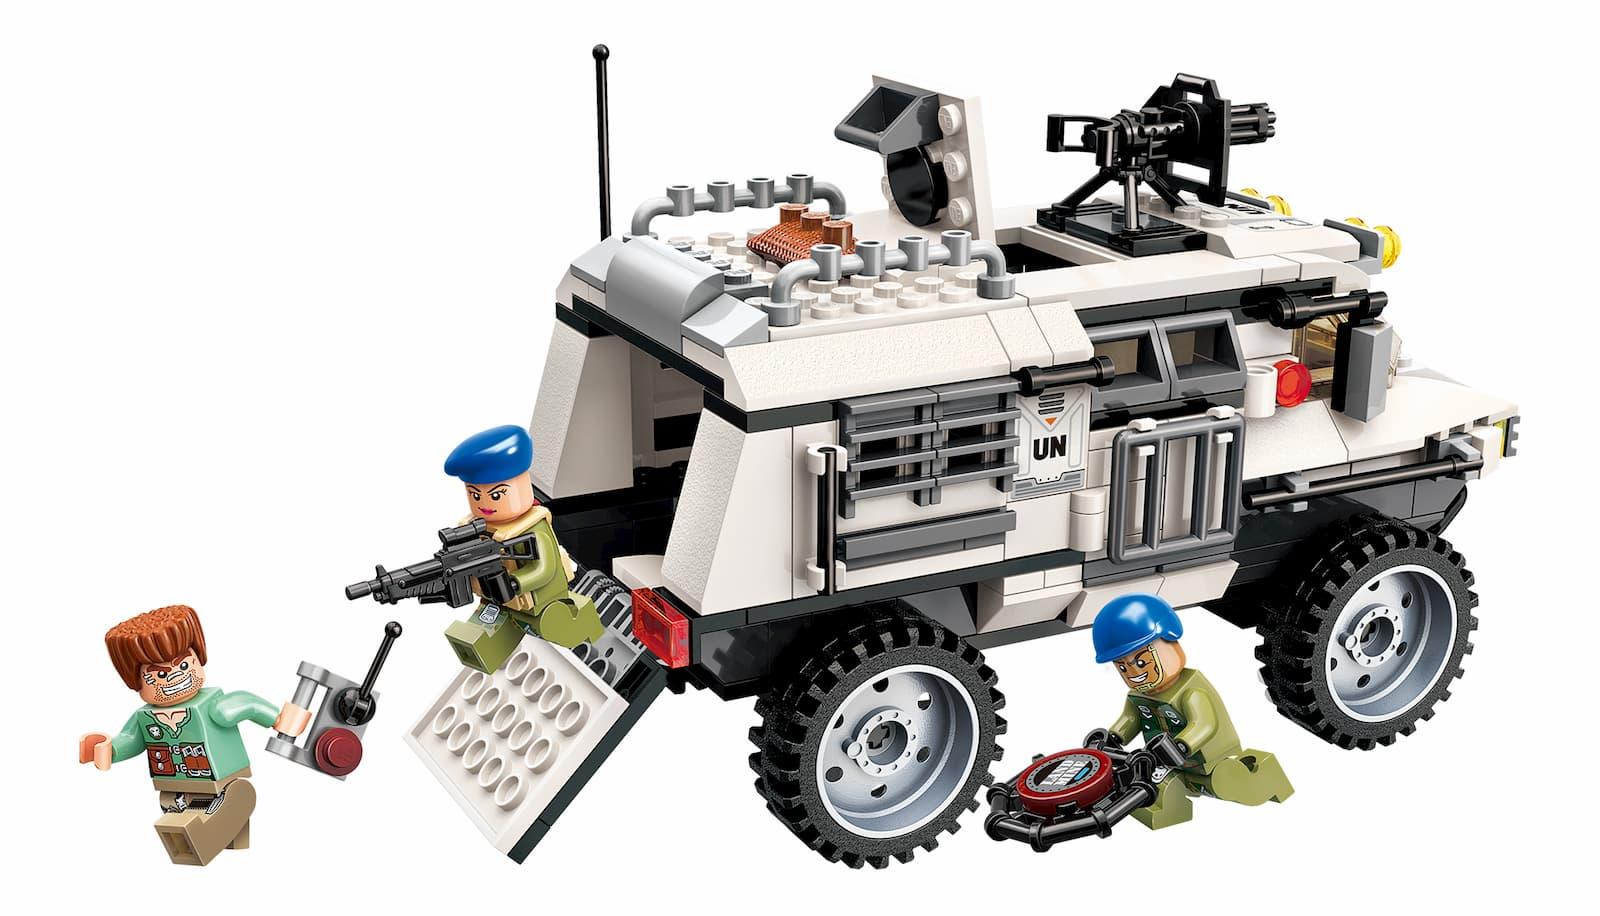 Конструктор Qman «Штурмовой бронетранспортер» 3204 Thunder Mission / 300 деталей